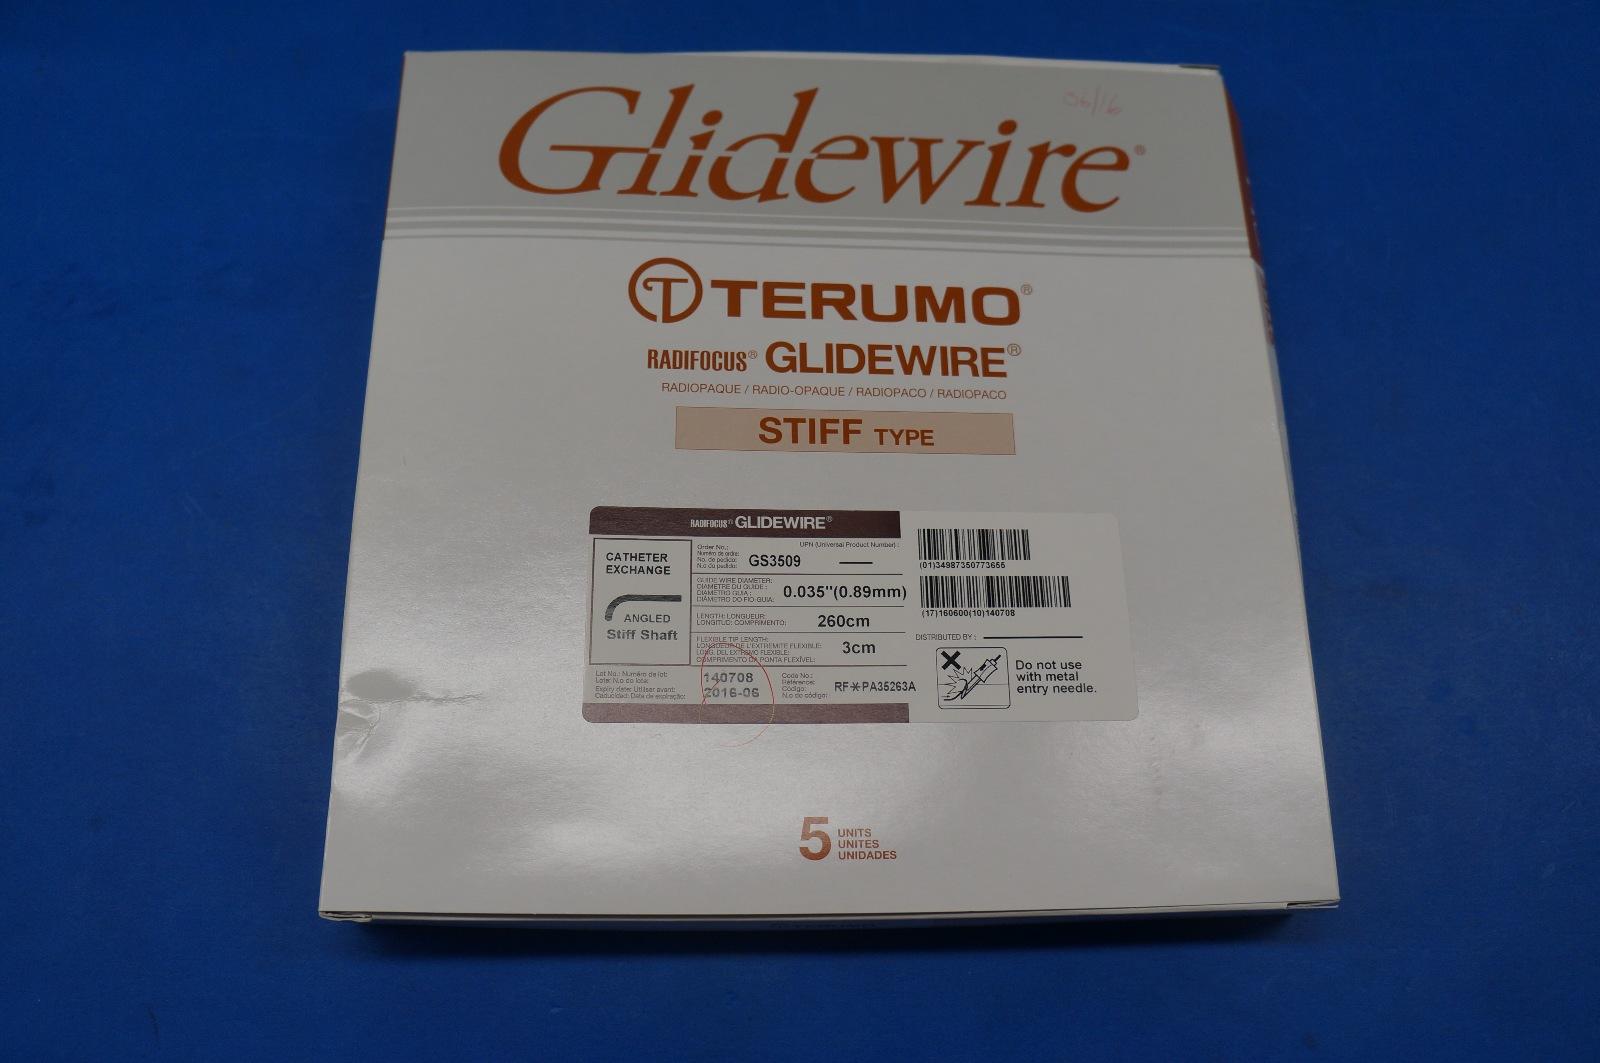 Glidewire GS3509 Terumo Radiofocus Angled Stiff Shaft 0.035 | eBay